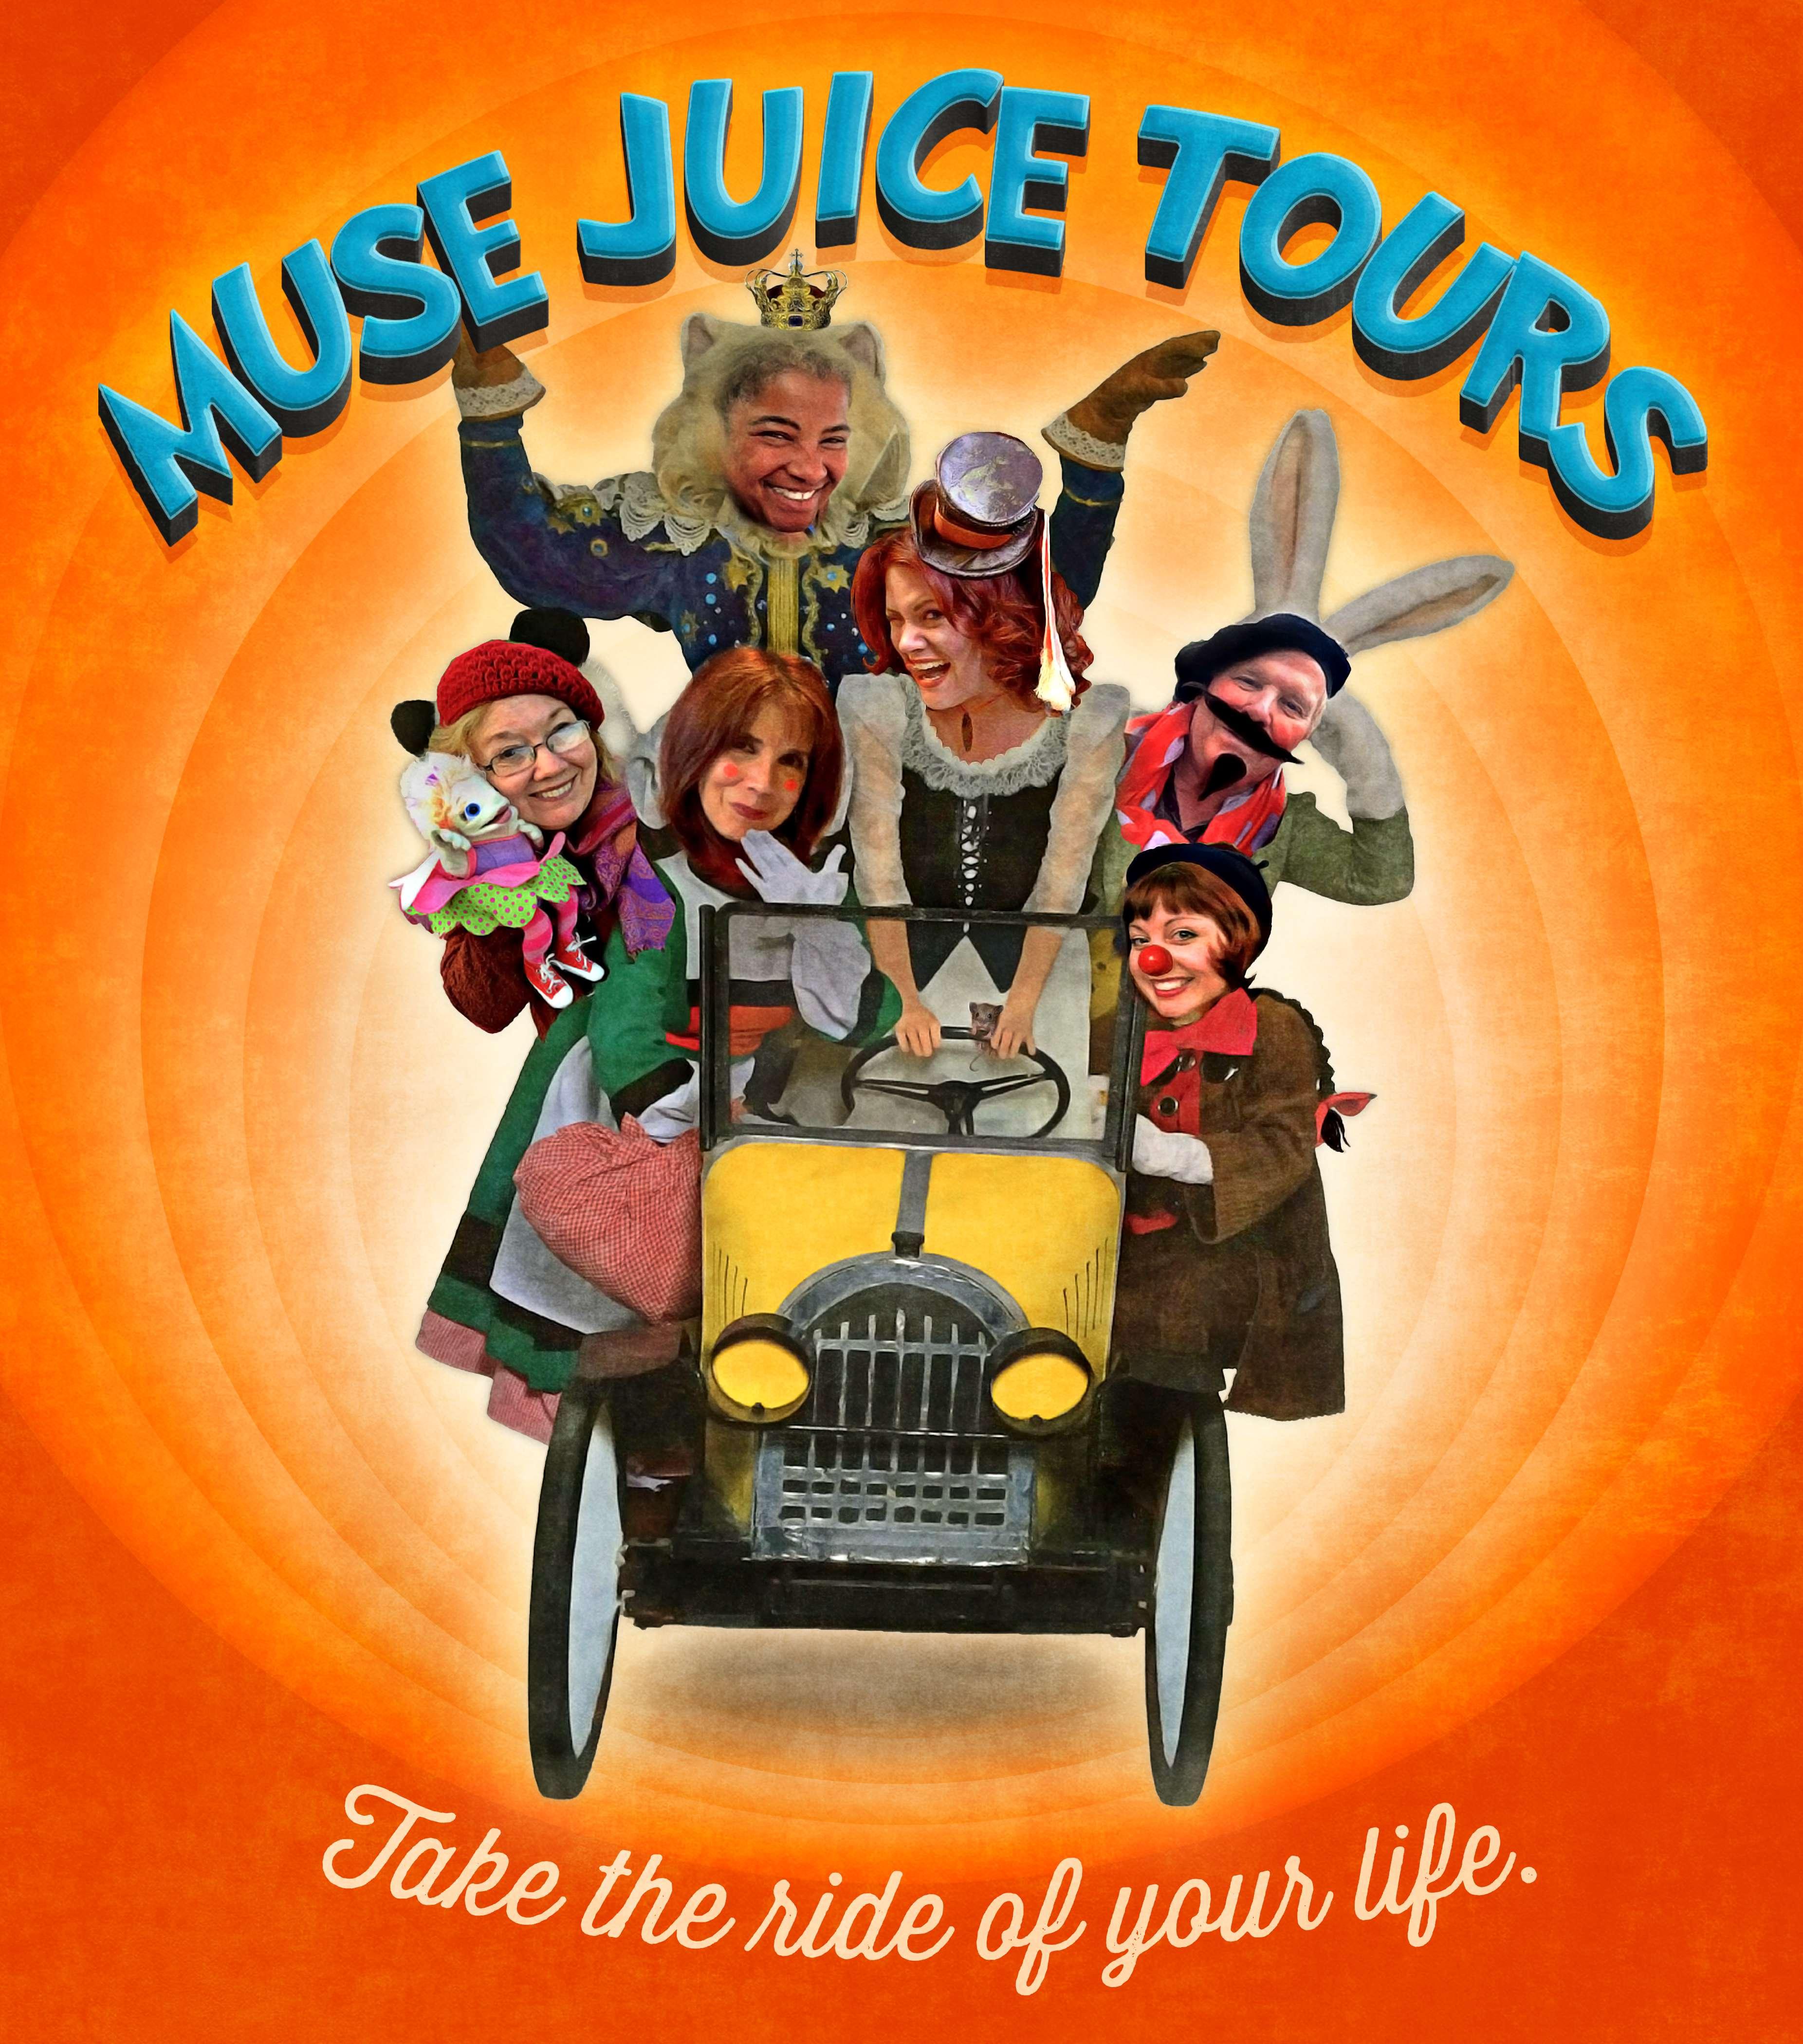 Muse Juice Tours